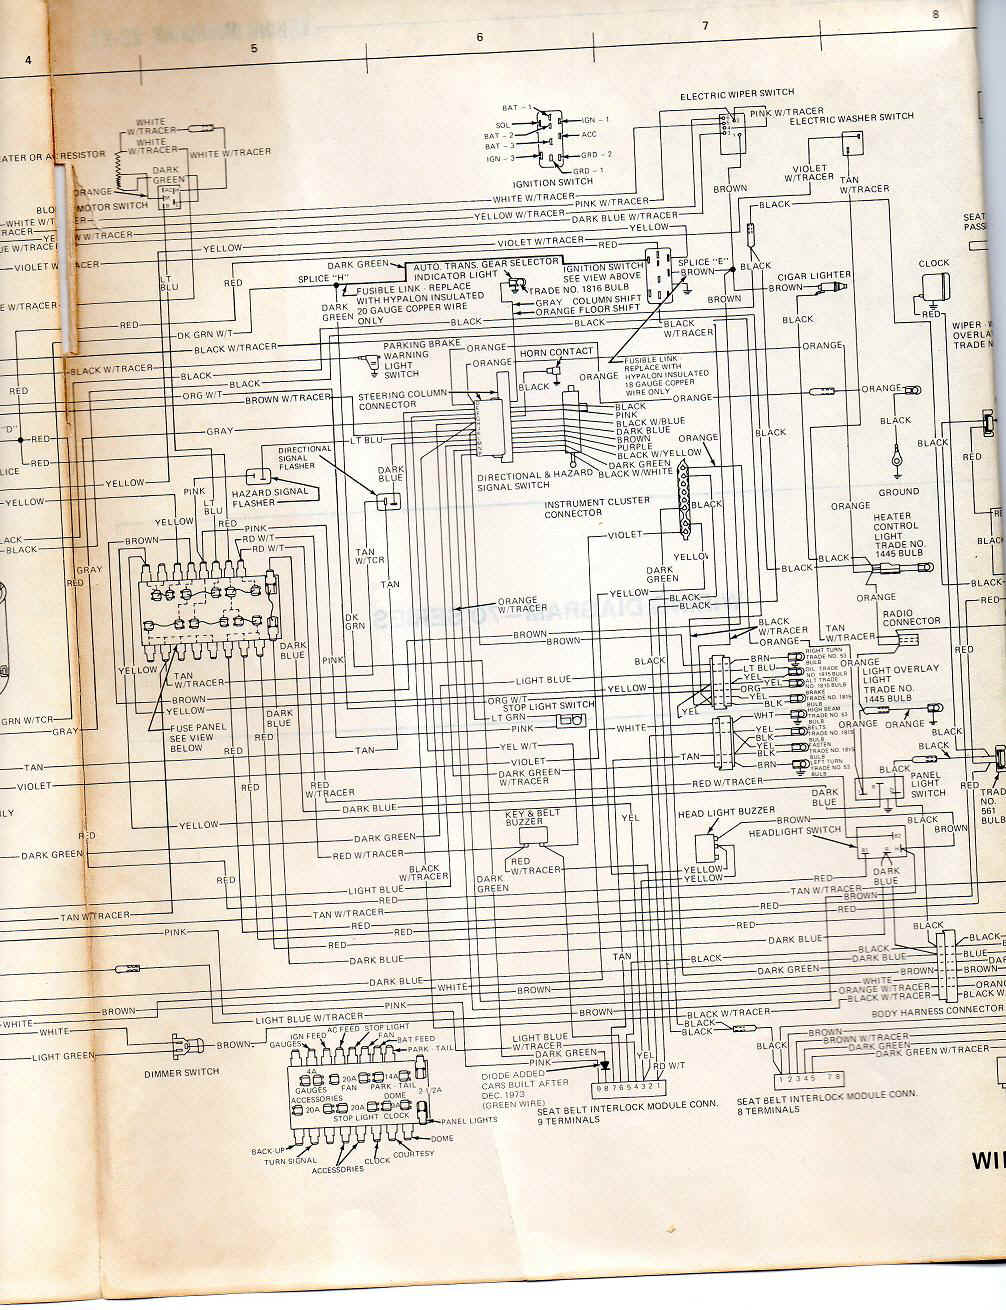 amc javelin tach wiring diagrams wiring diagram Chevy Truck Wiring Harness Diagram amc javelin tach wiring diagrams detailed wiring diagram1968 amc javelin tachometer wiring diagram auto electrical wiring